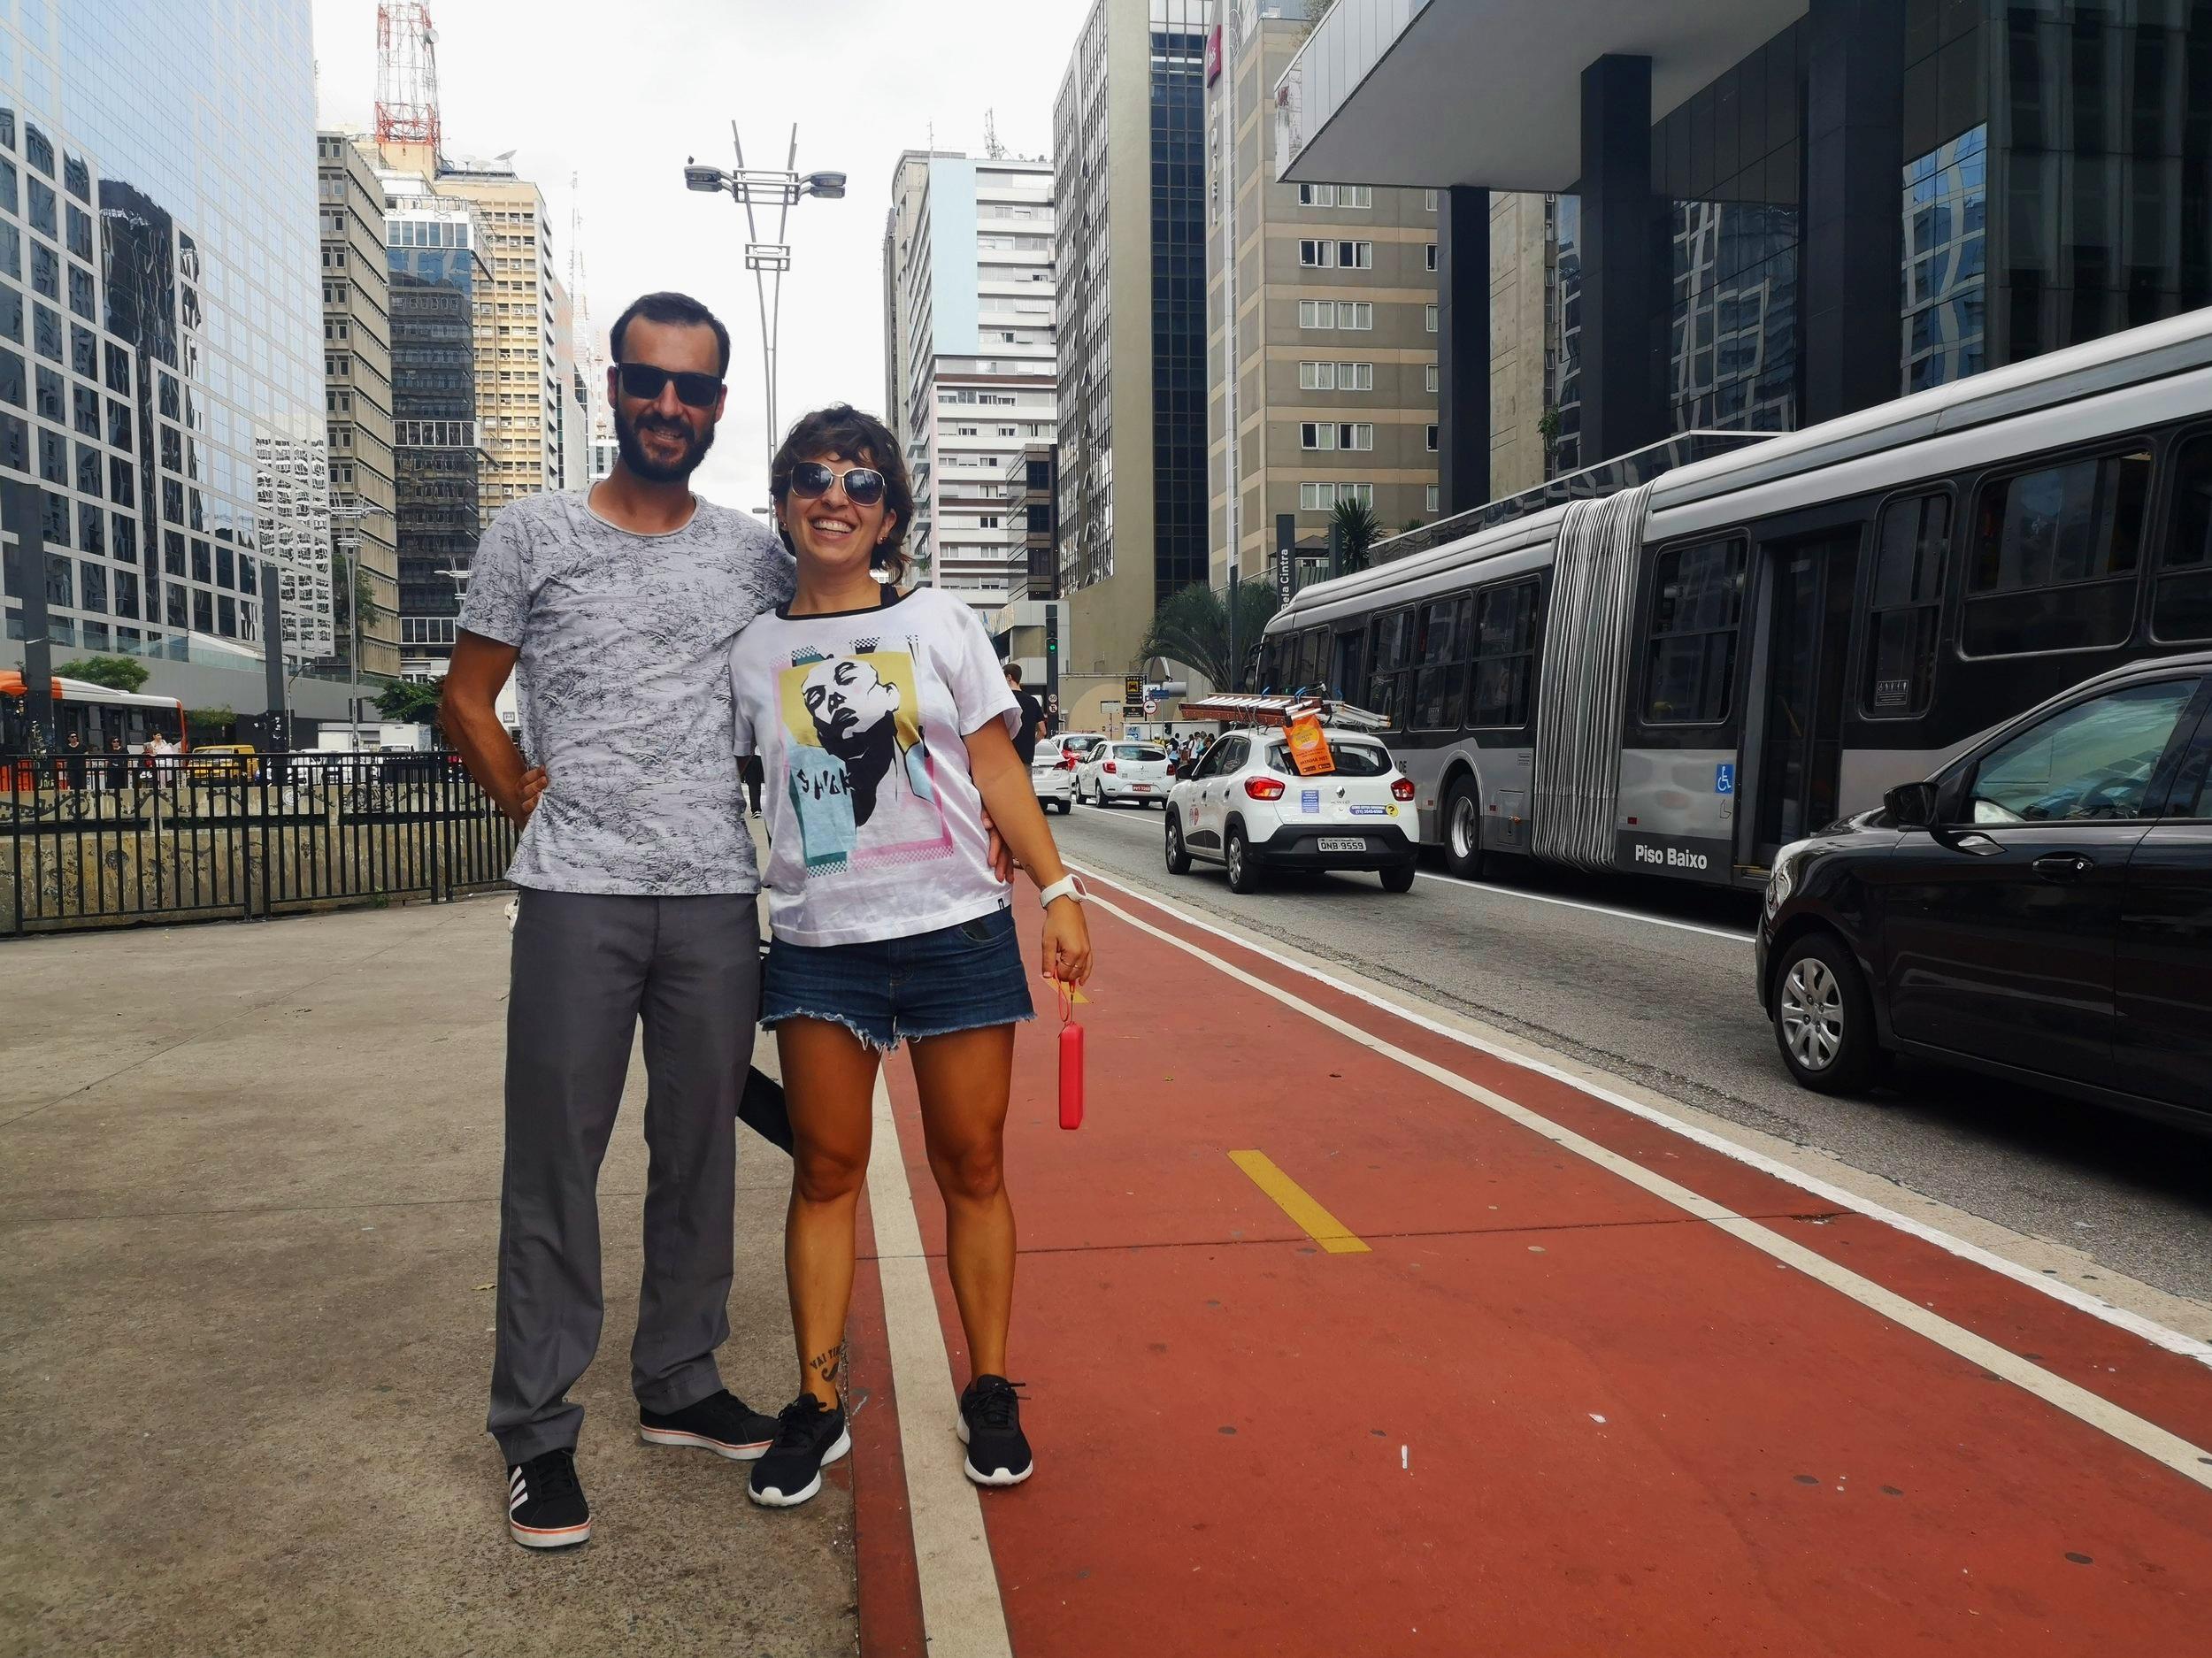 Aline Cavalcante and her partner Brunno Carvalho nearby Praca Cyclista on Paulista Avenue.